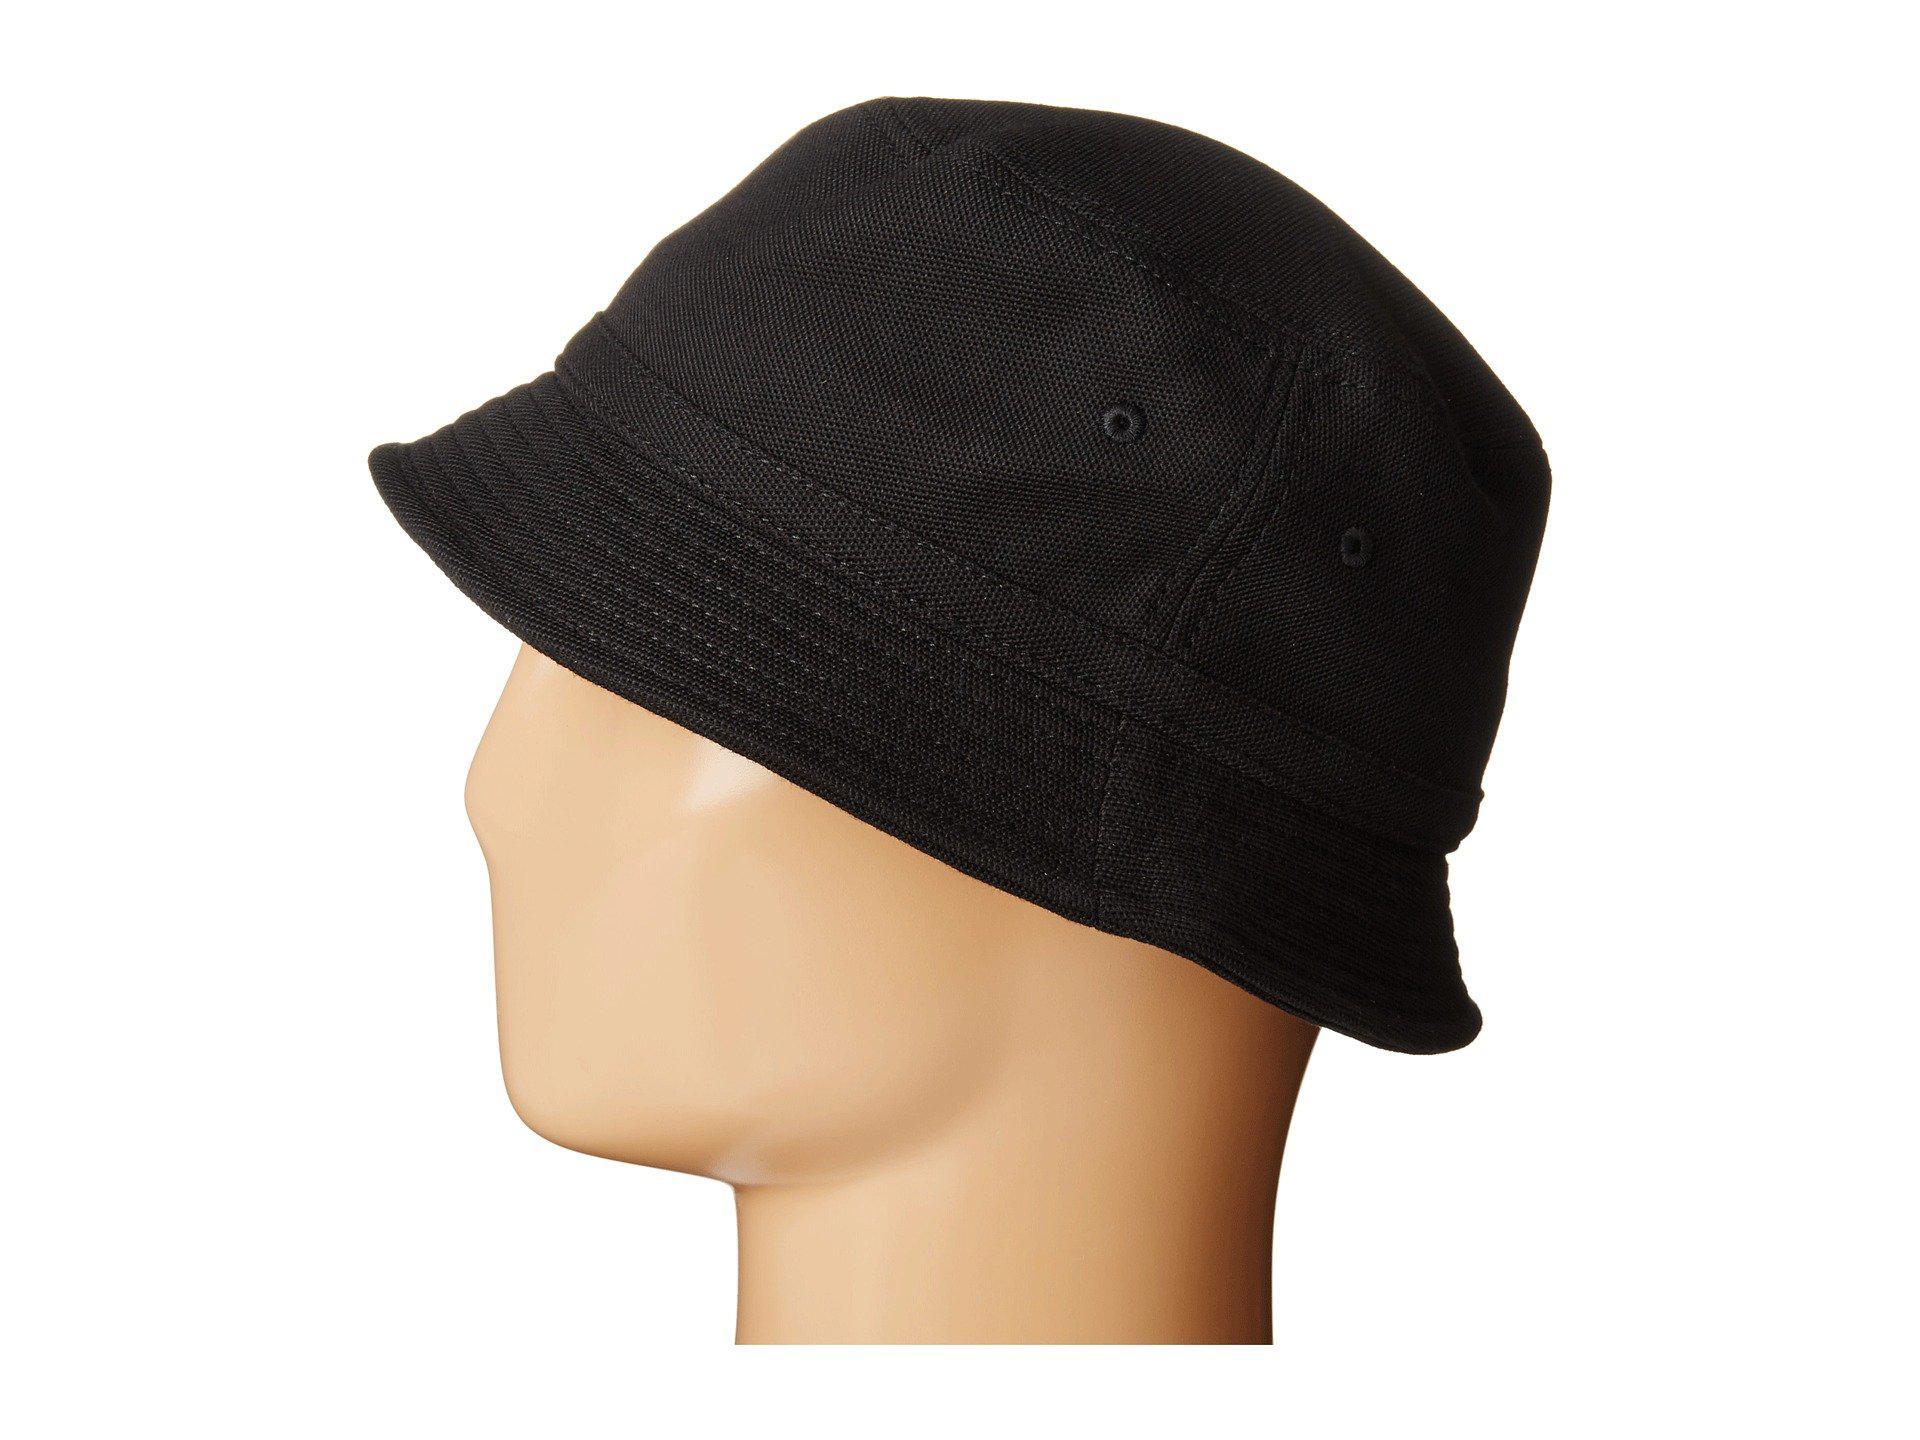 c10dfc55 Lacoste Pique Bucket Hat (black) Caps in Black for Men - Lyst